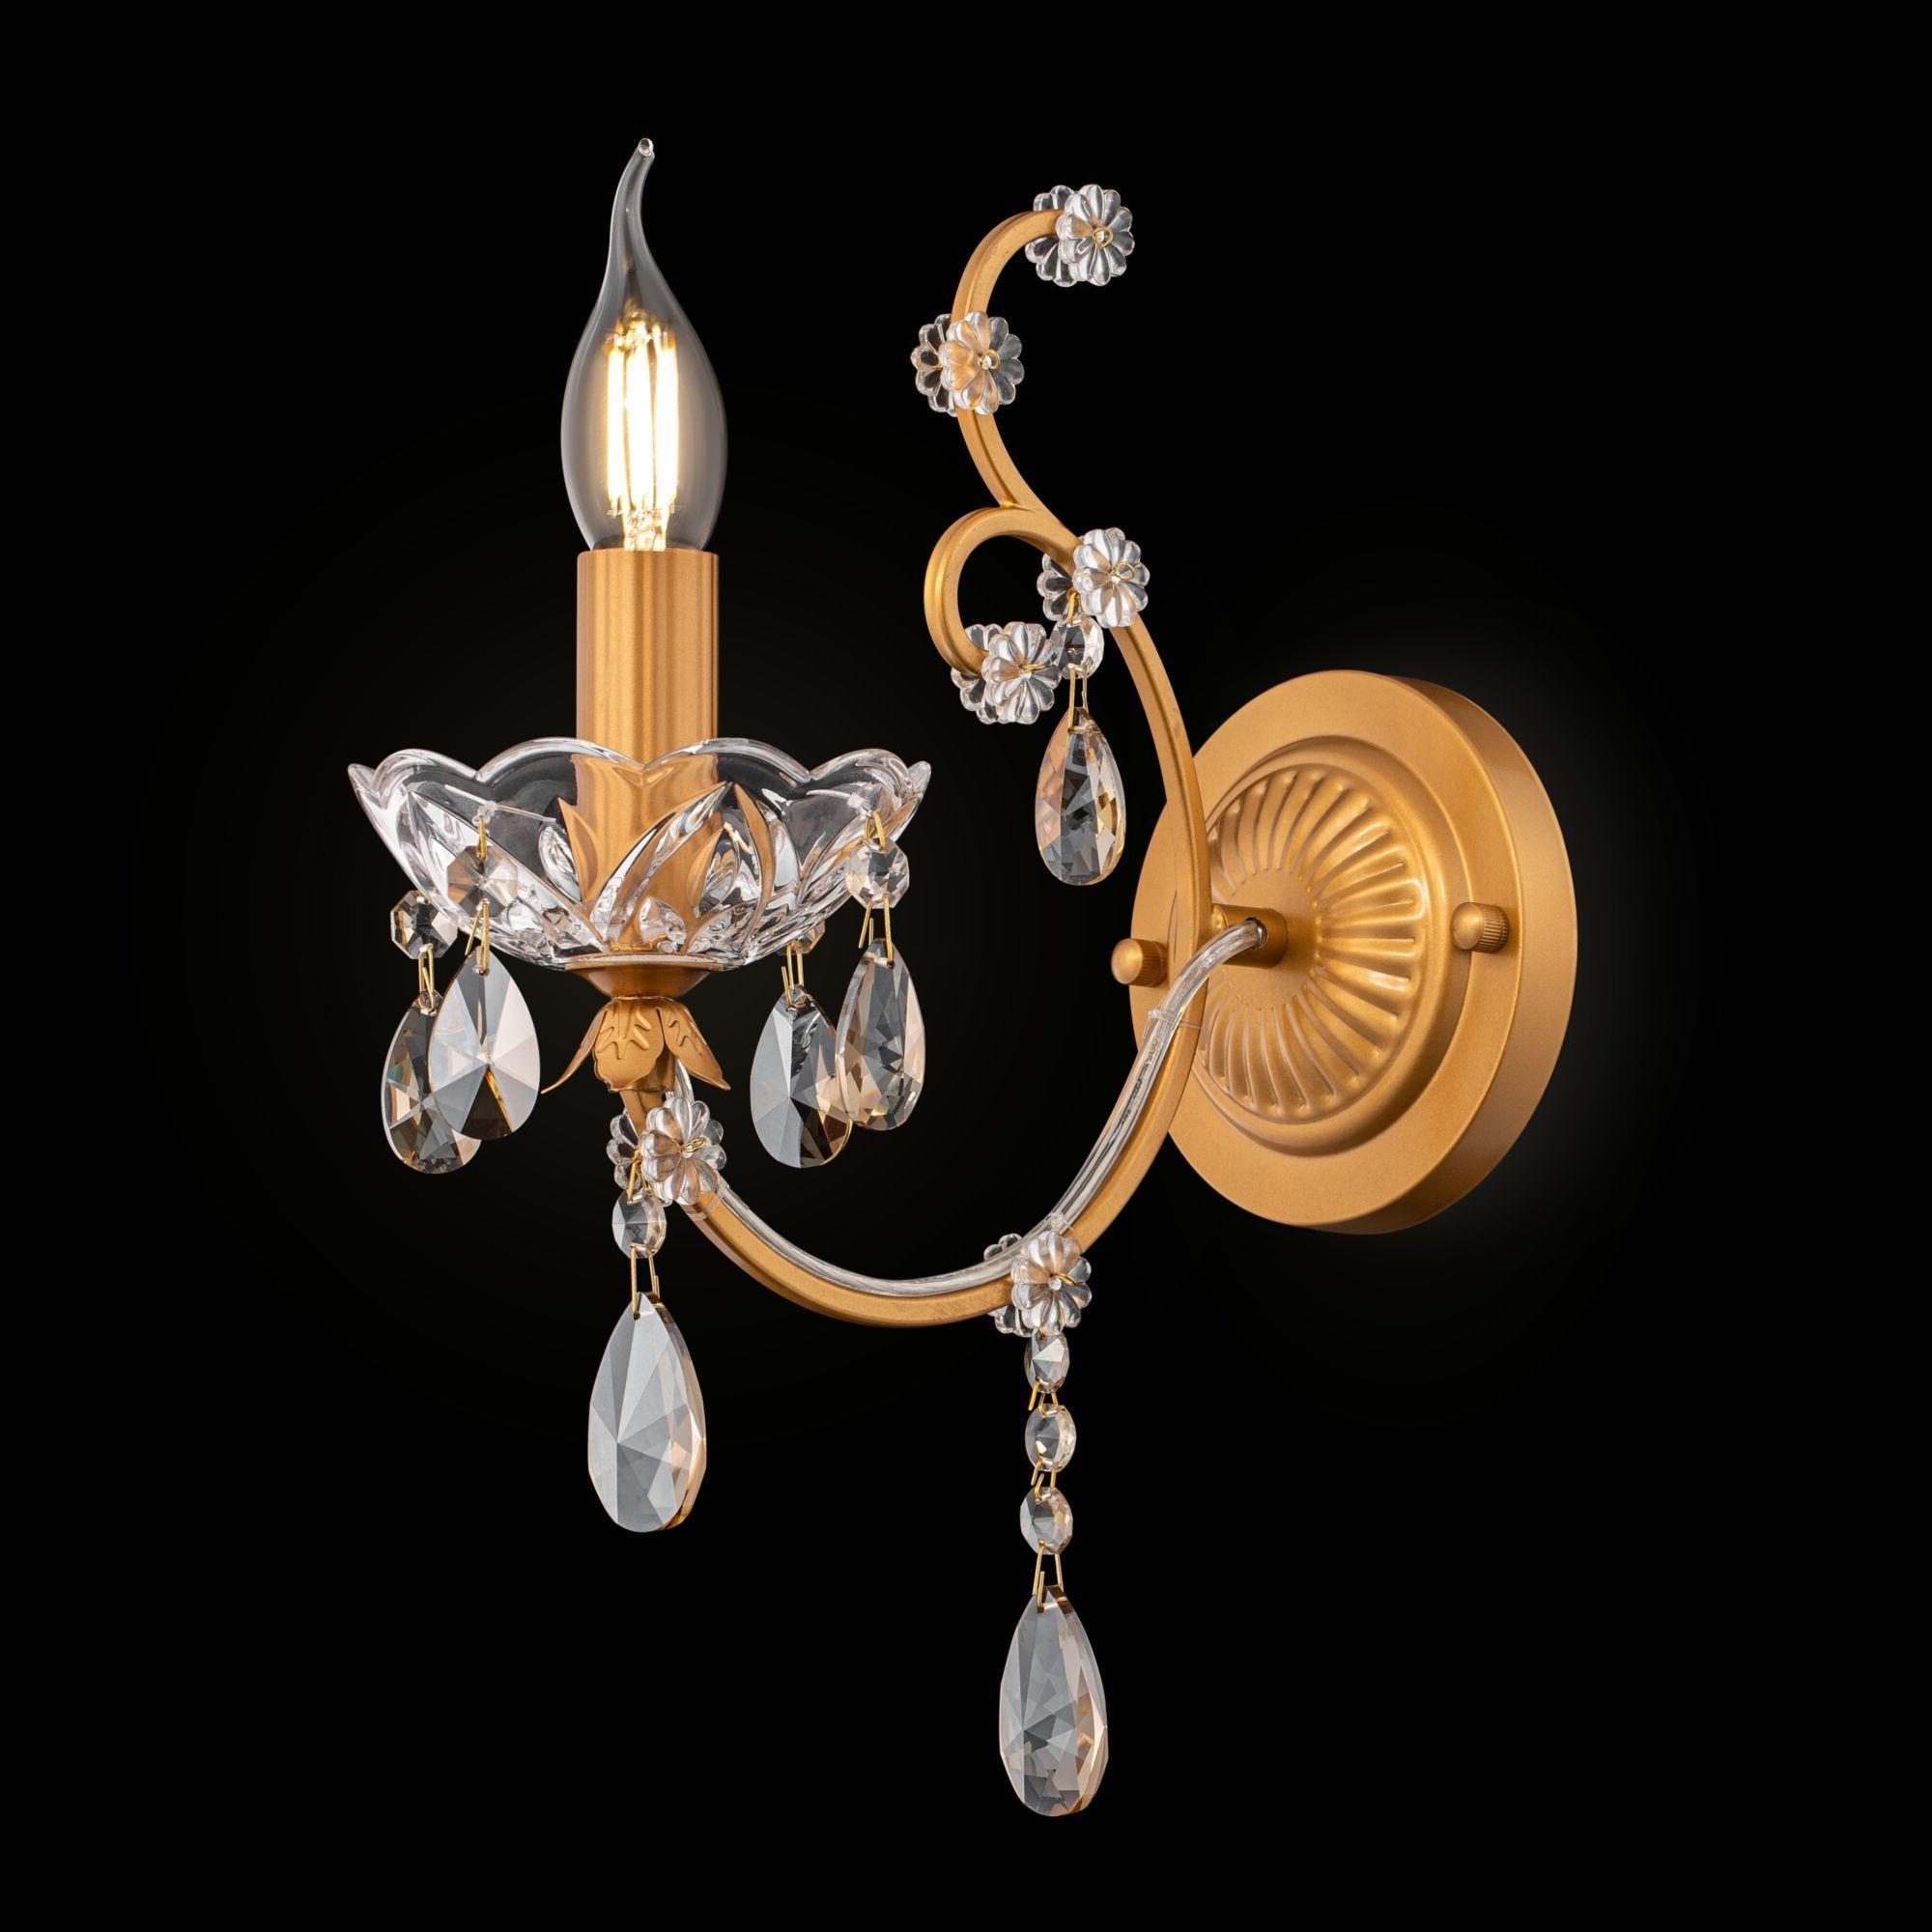 Бра Maytoni Royal Classic Sevilla DIA004-01-G, 1xE14x60W, золото с прозрачным, коньячный, металл со стеклом, хрусталь - фото 2